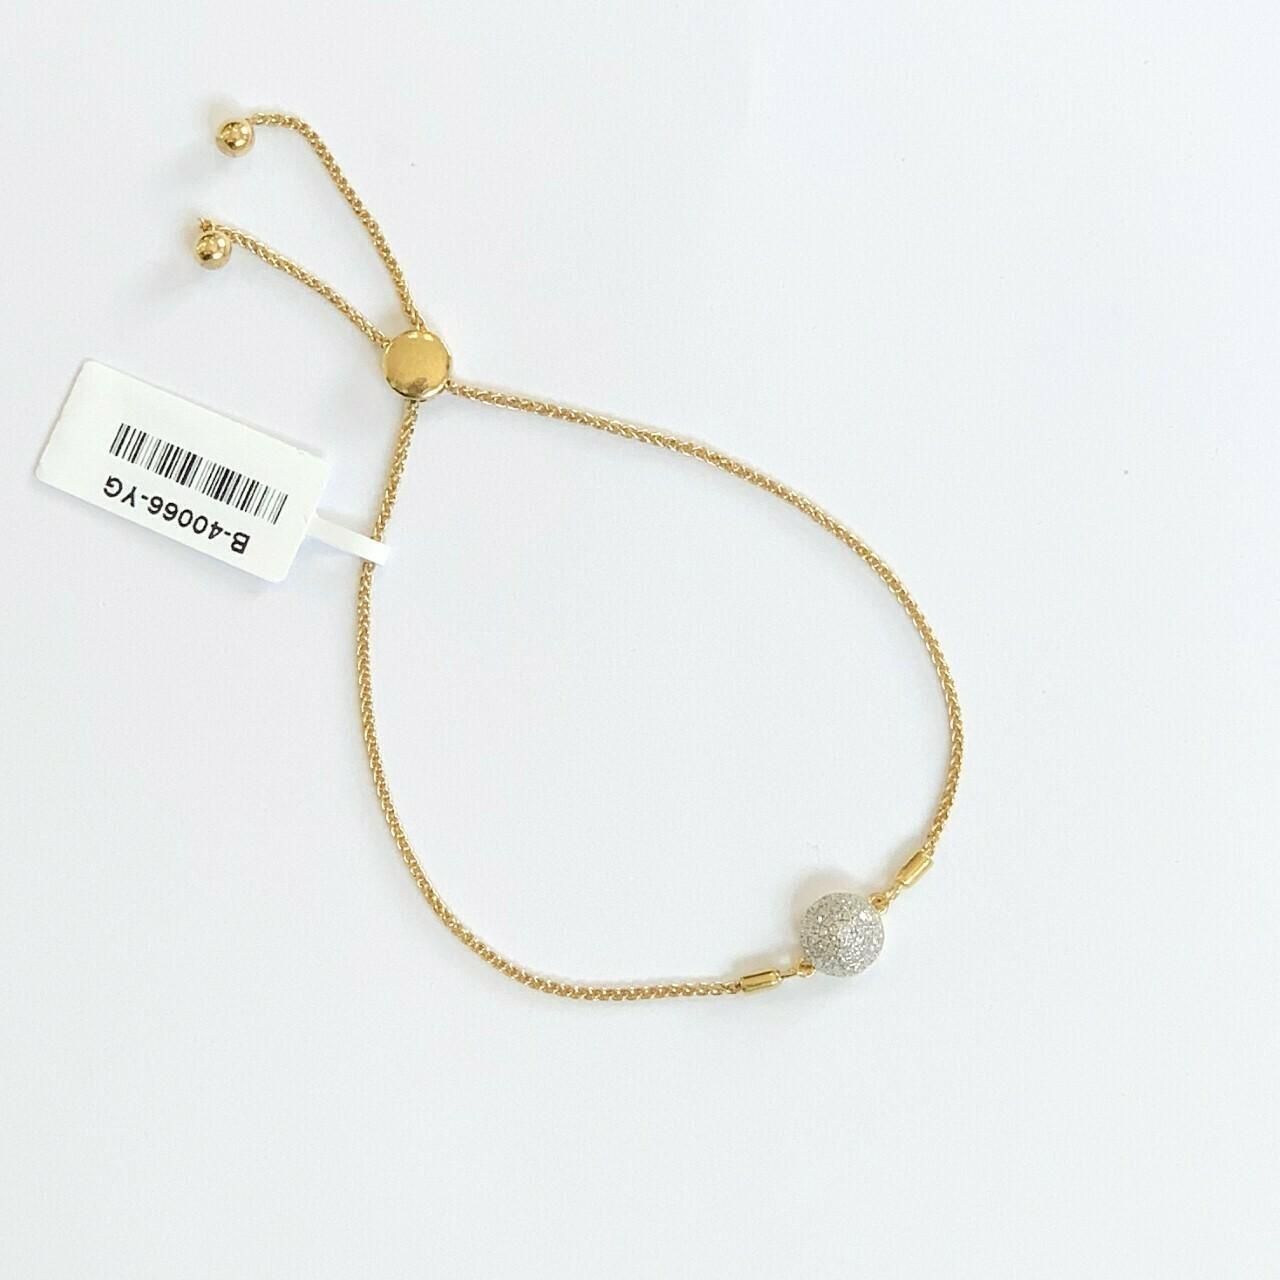 Ella Stein Domed Disc Bolo Bracelet (Gold)